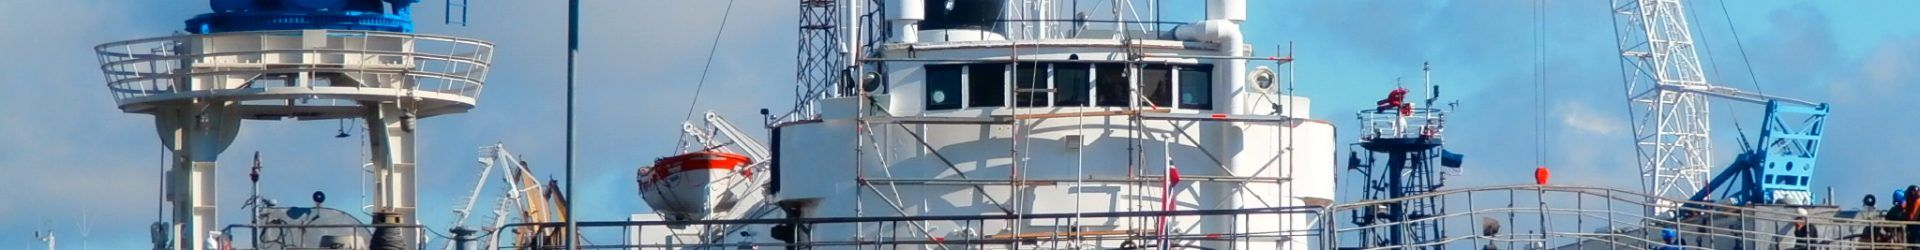 Во Владивостоке затонул плавучий док